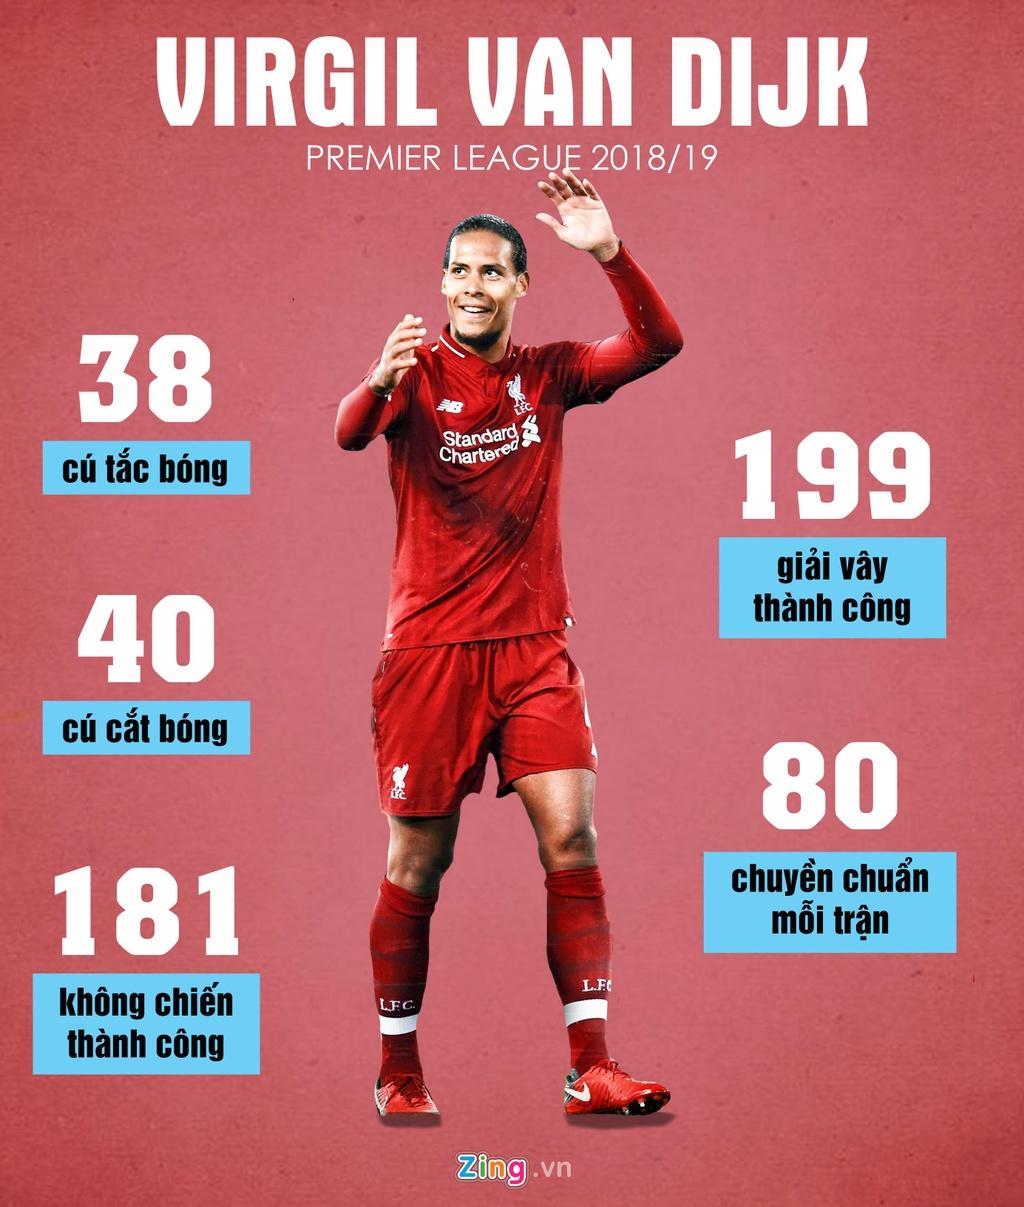 'Ronaldo xuat sac, nhung Van Dijk moi la nguoi chien thang' hinh anh 2